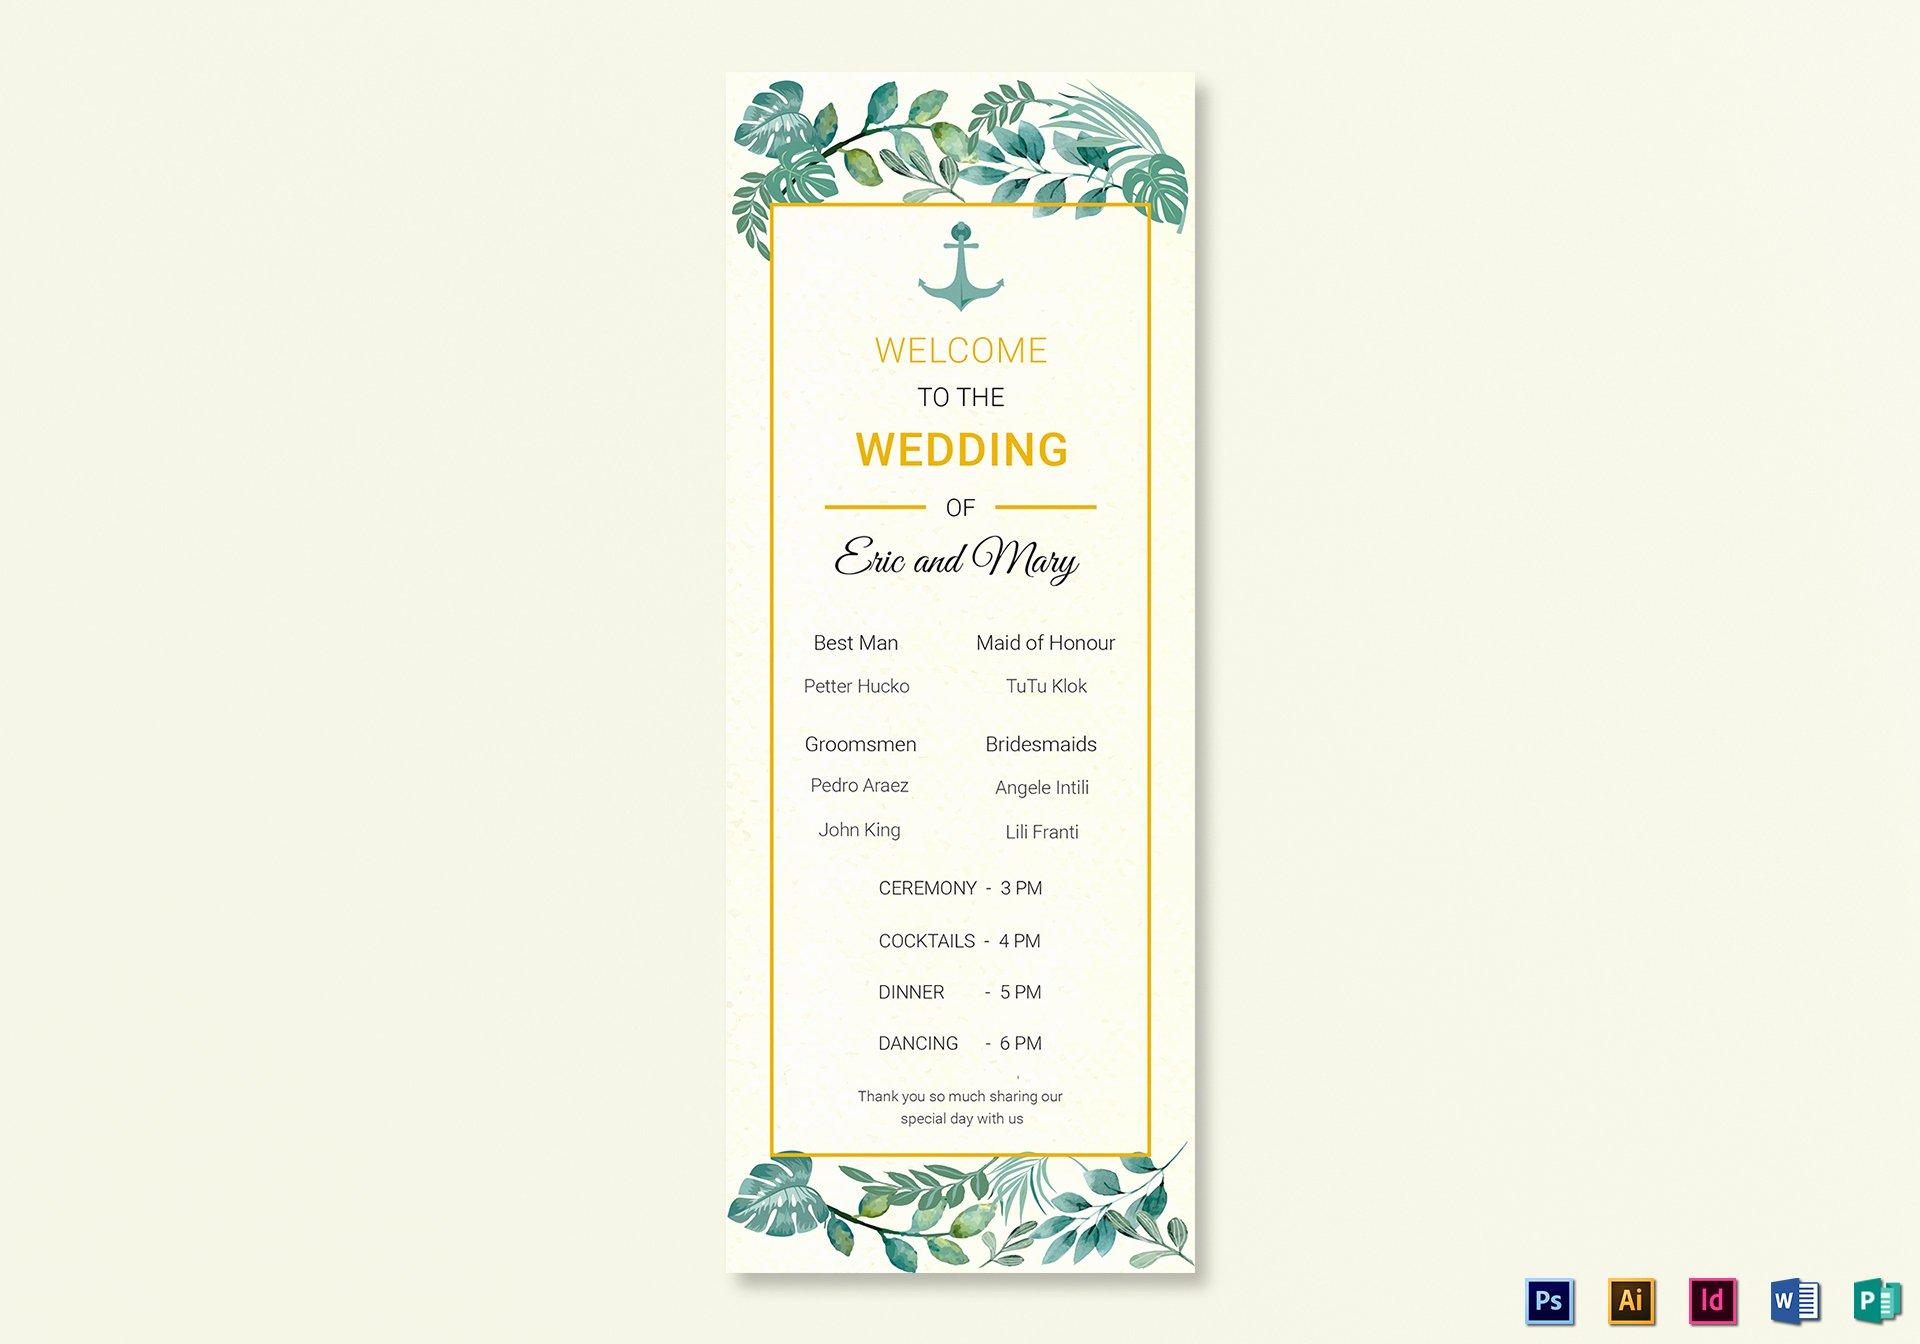 Indesign Wedding Program Template Beautiful Nautical Wedding Program Card Template In Psd Word Publisher Illustrator Indesign